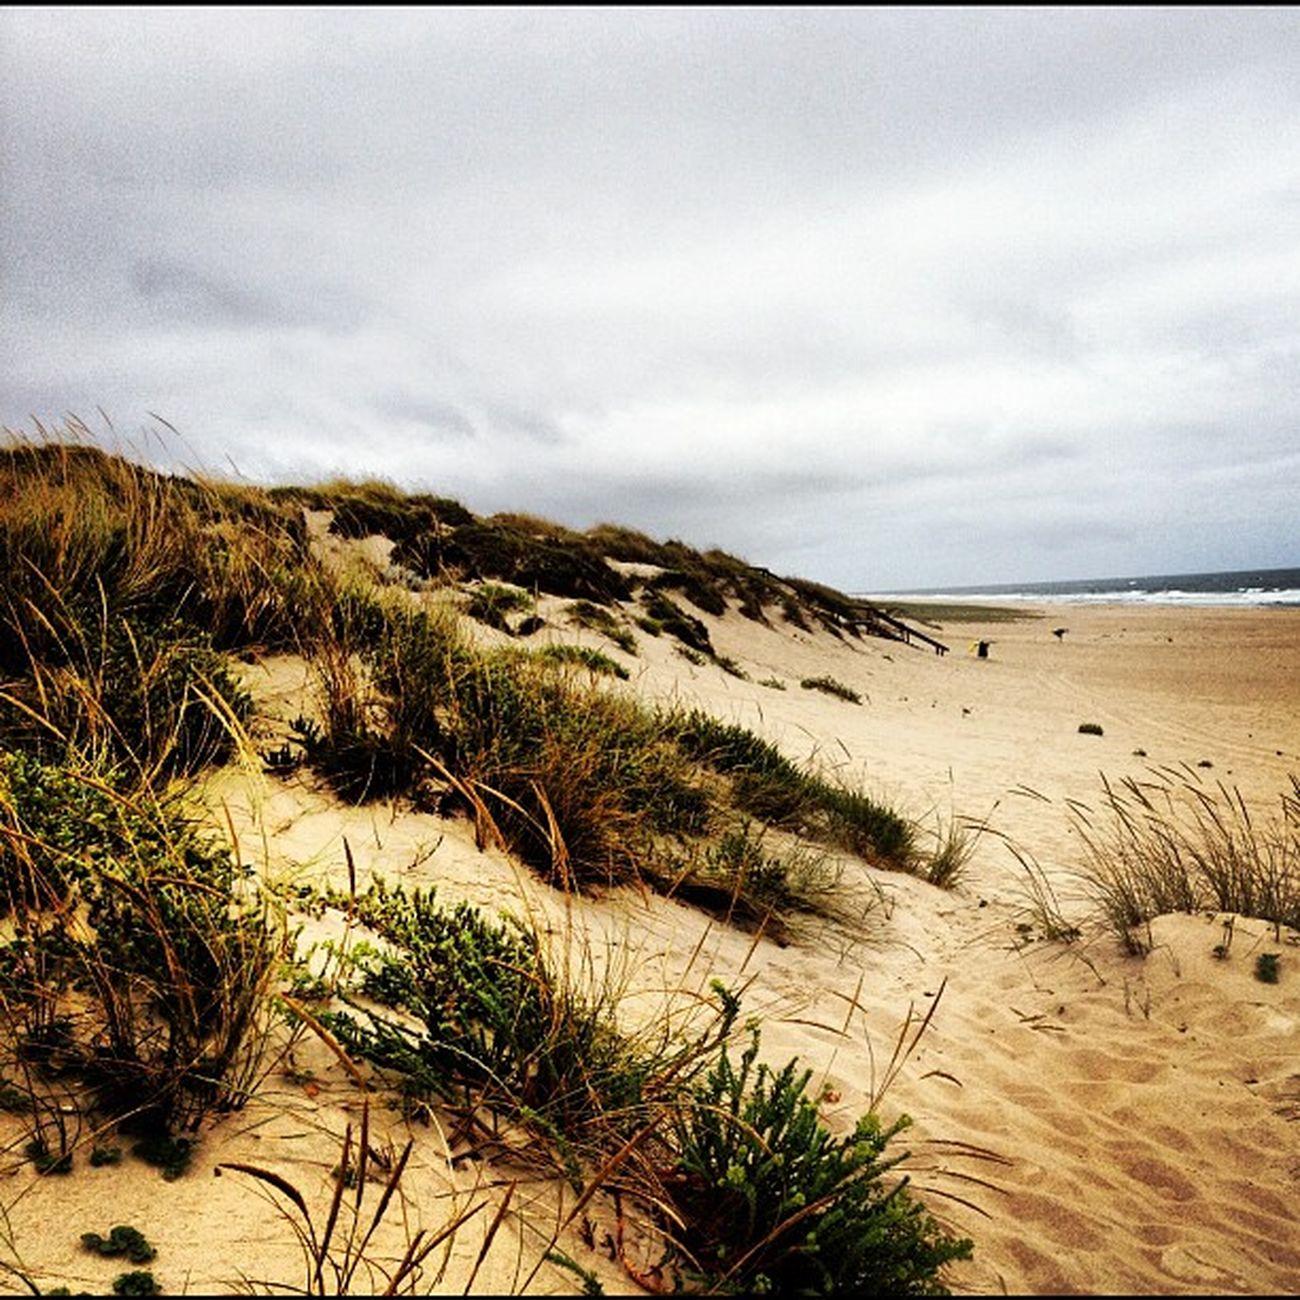 #cantanhede #tocha #portugal #instagood #instagram #photooftheday #beach #praia Tocha Cantanhede Beach Praia Portugal Photooftheday Instagram Instagood